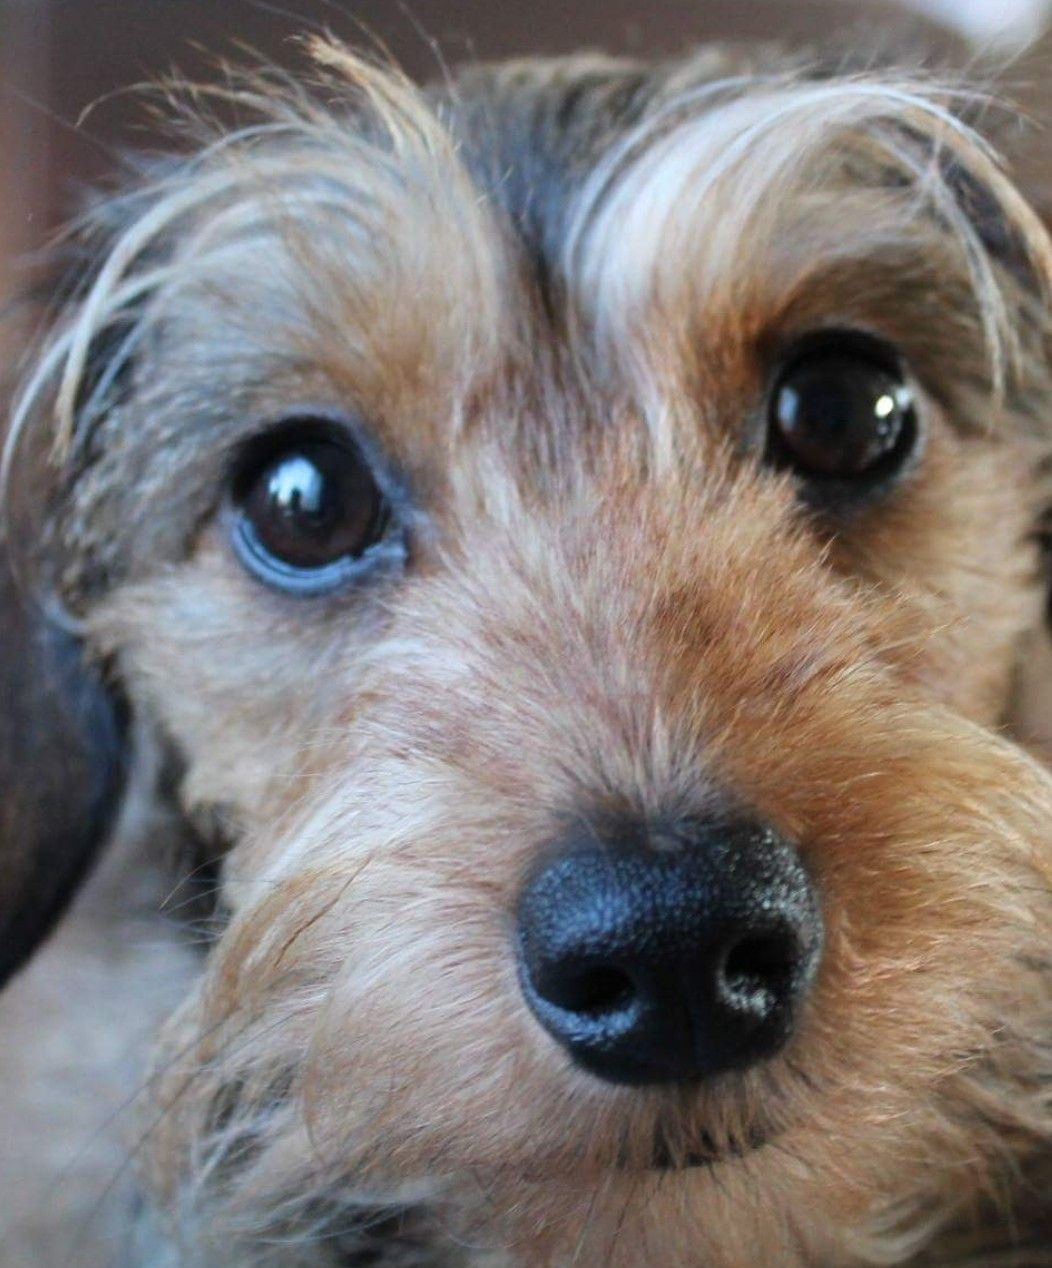 Boston Terrier Wire Haired Dachshand Half And Center F350 Wiring Diagram Http Wwwjustanswercom Ford 50adb2008f350 Dachshund Yorkie Mix Dogs Bing Images Wow Pinterest Rh Com